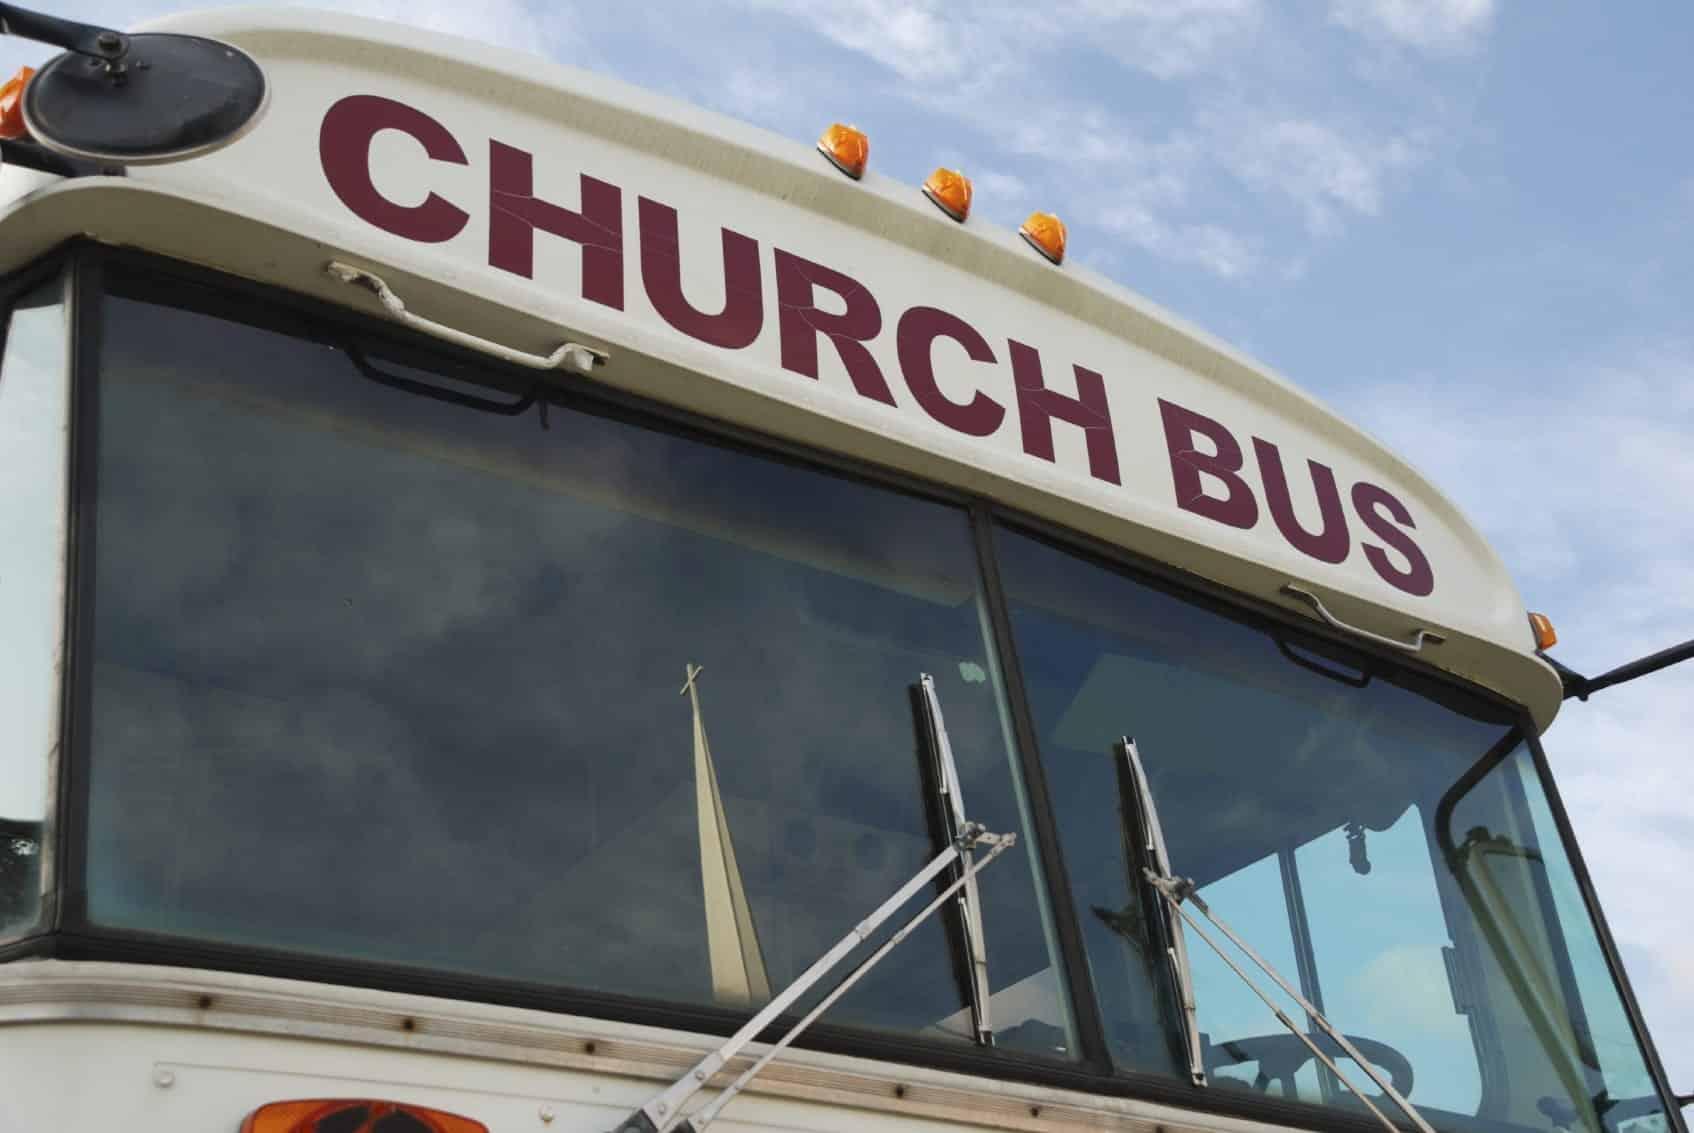 Church Bus Stock Photo